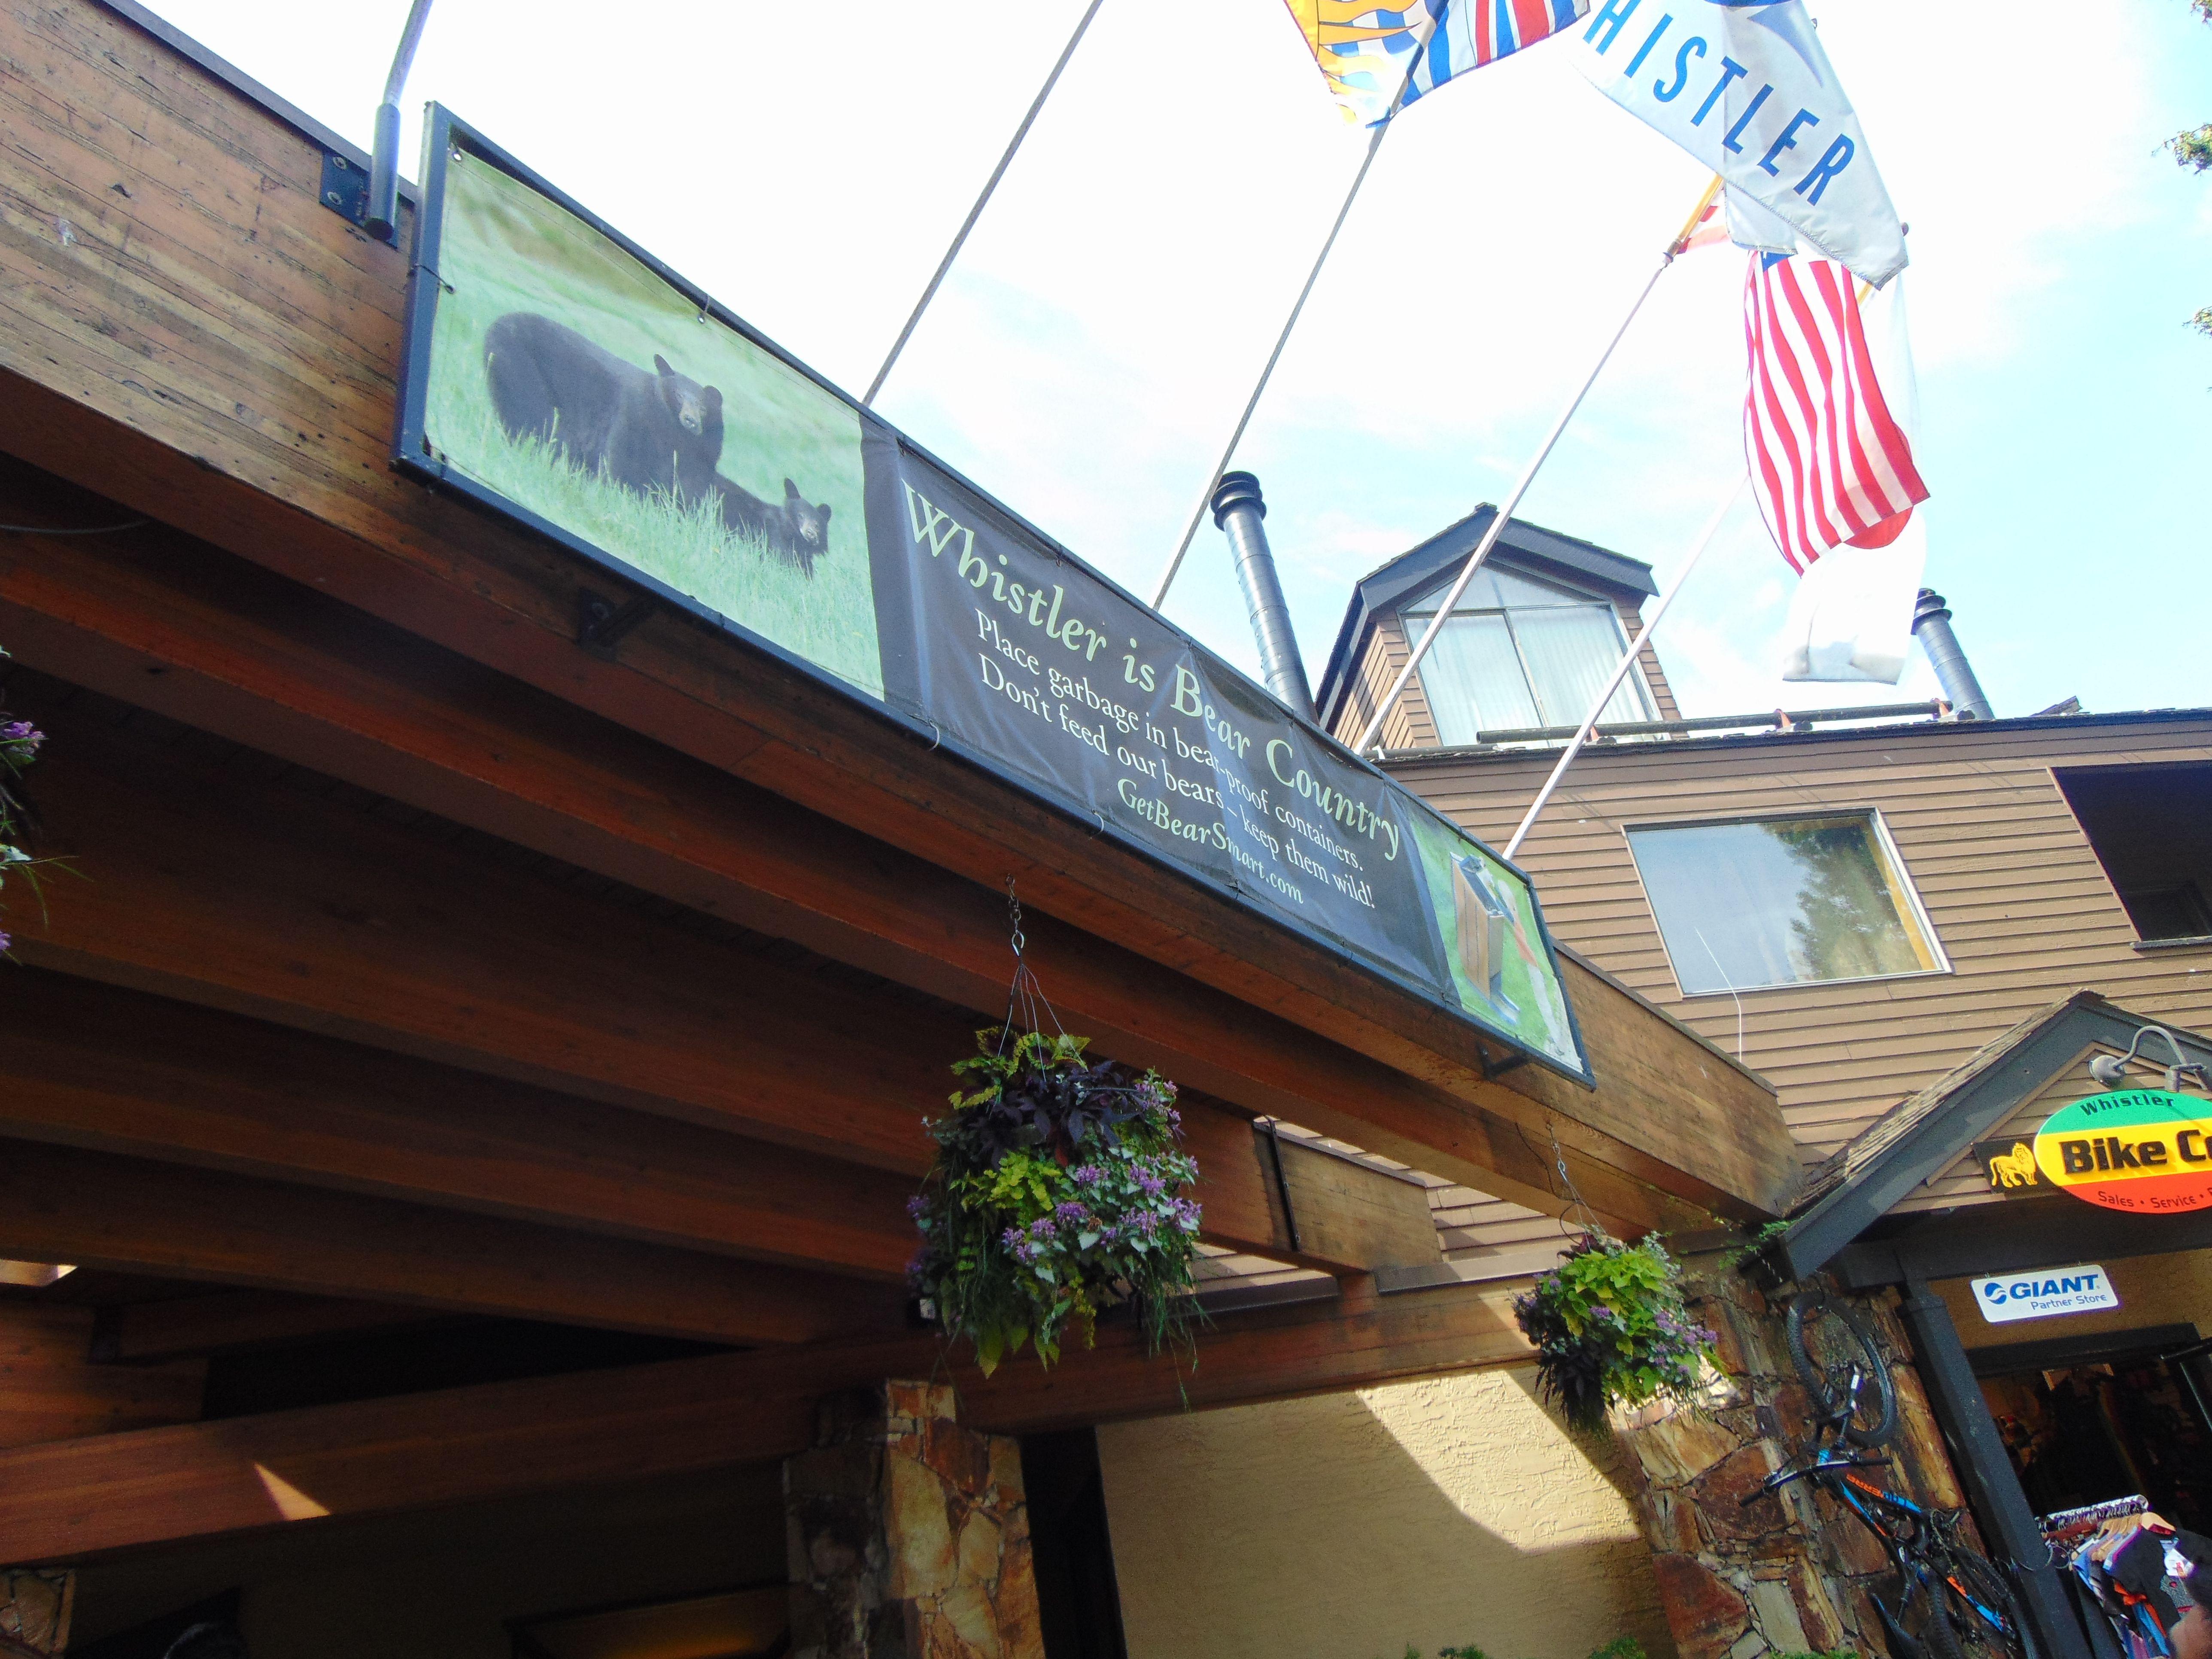 Whistler, BC - Canada  #whistler #canada #britshcolumbia #travel #trip #beautiful #city #village